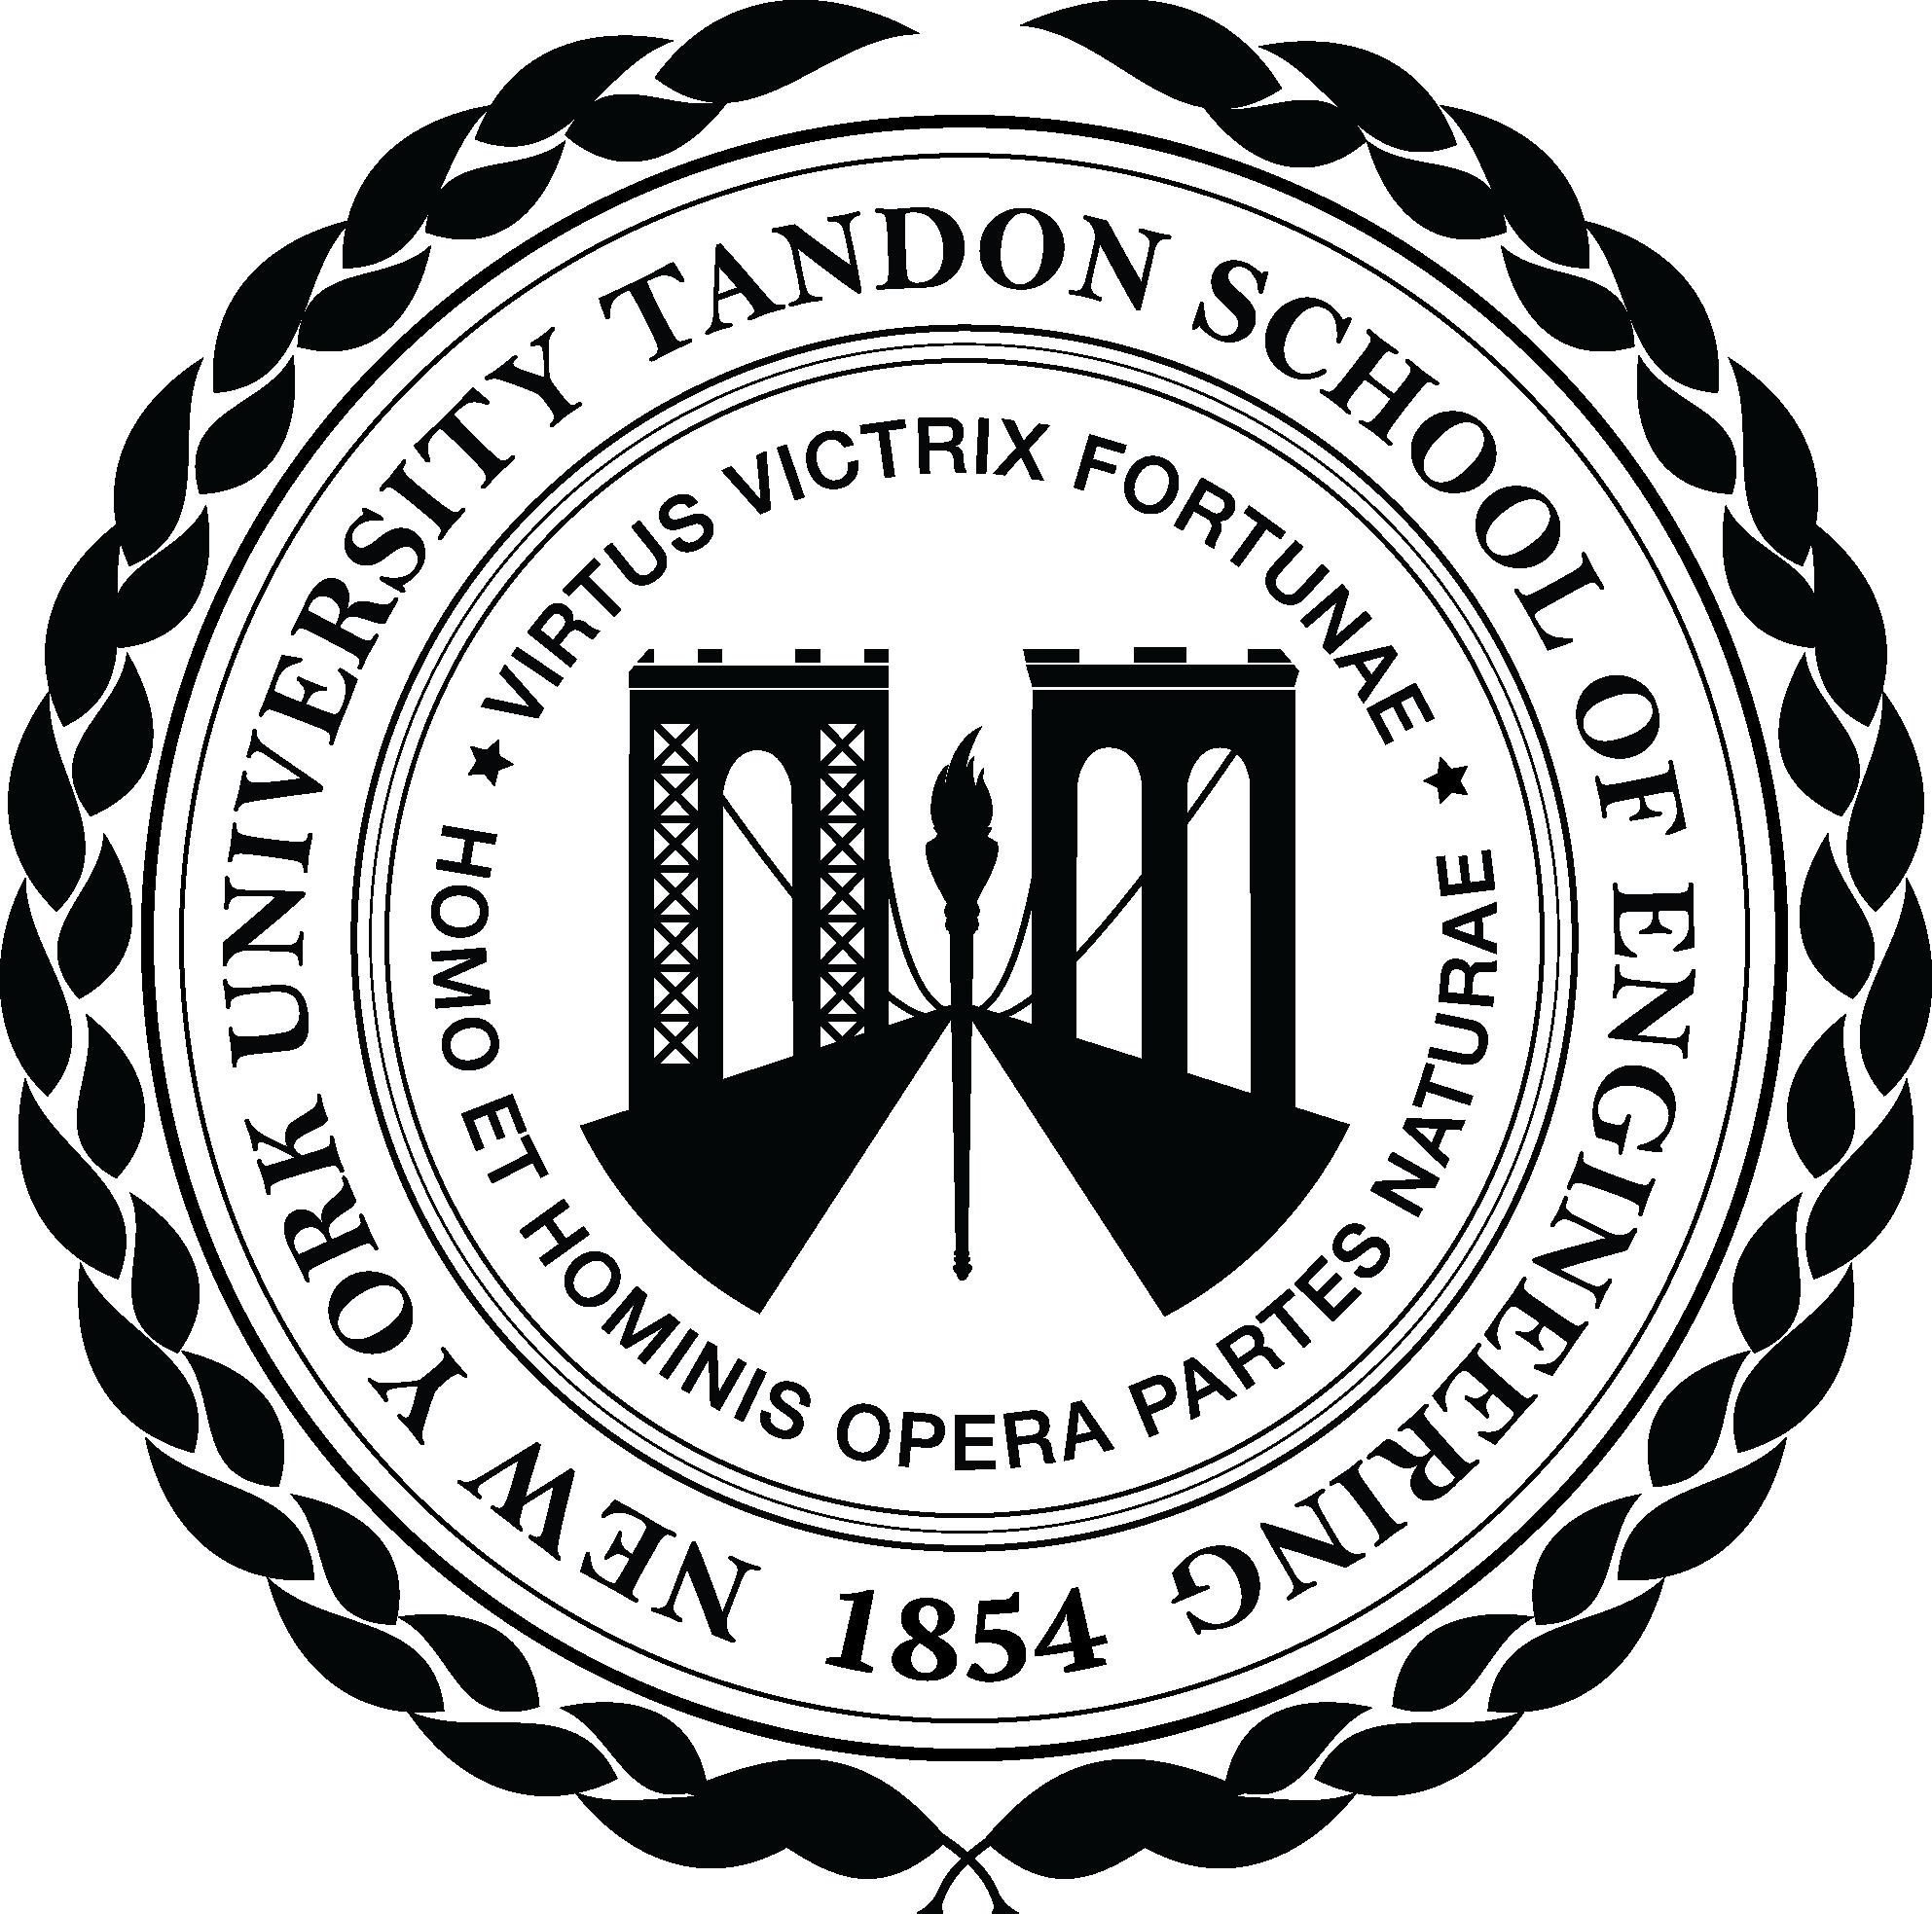 tandon history nyu tandon school of engineering Who Made the Henry J tandon seal